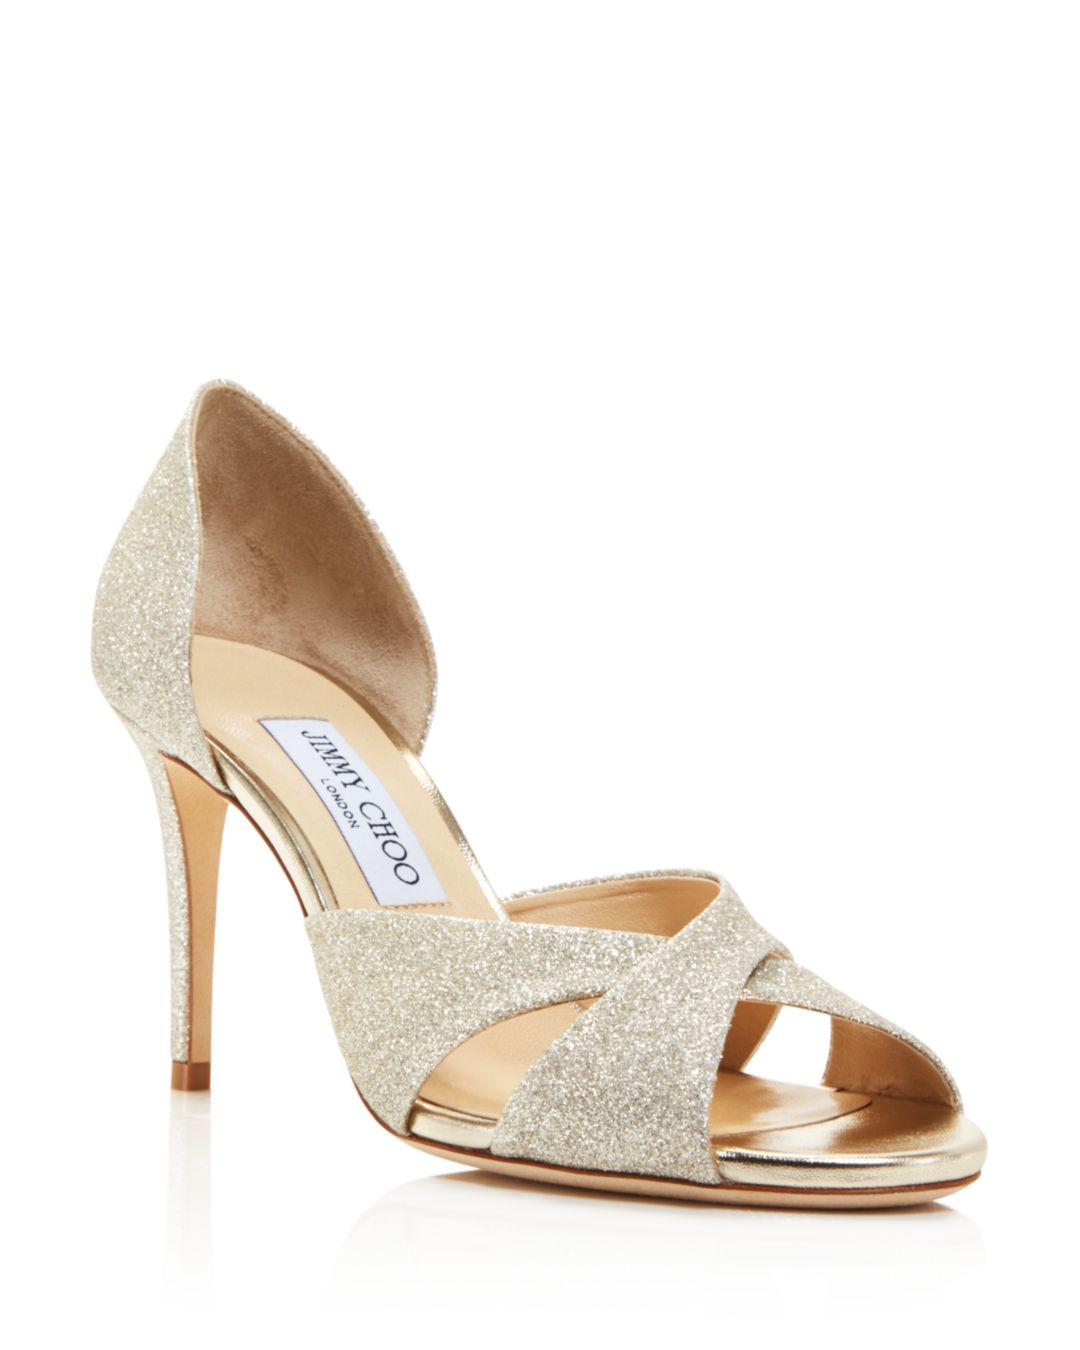 eb63b8045c2 Lyst - Jimmy Choo Women s Lara 85 Glitter D orsay High-heel Sandals ...